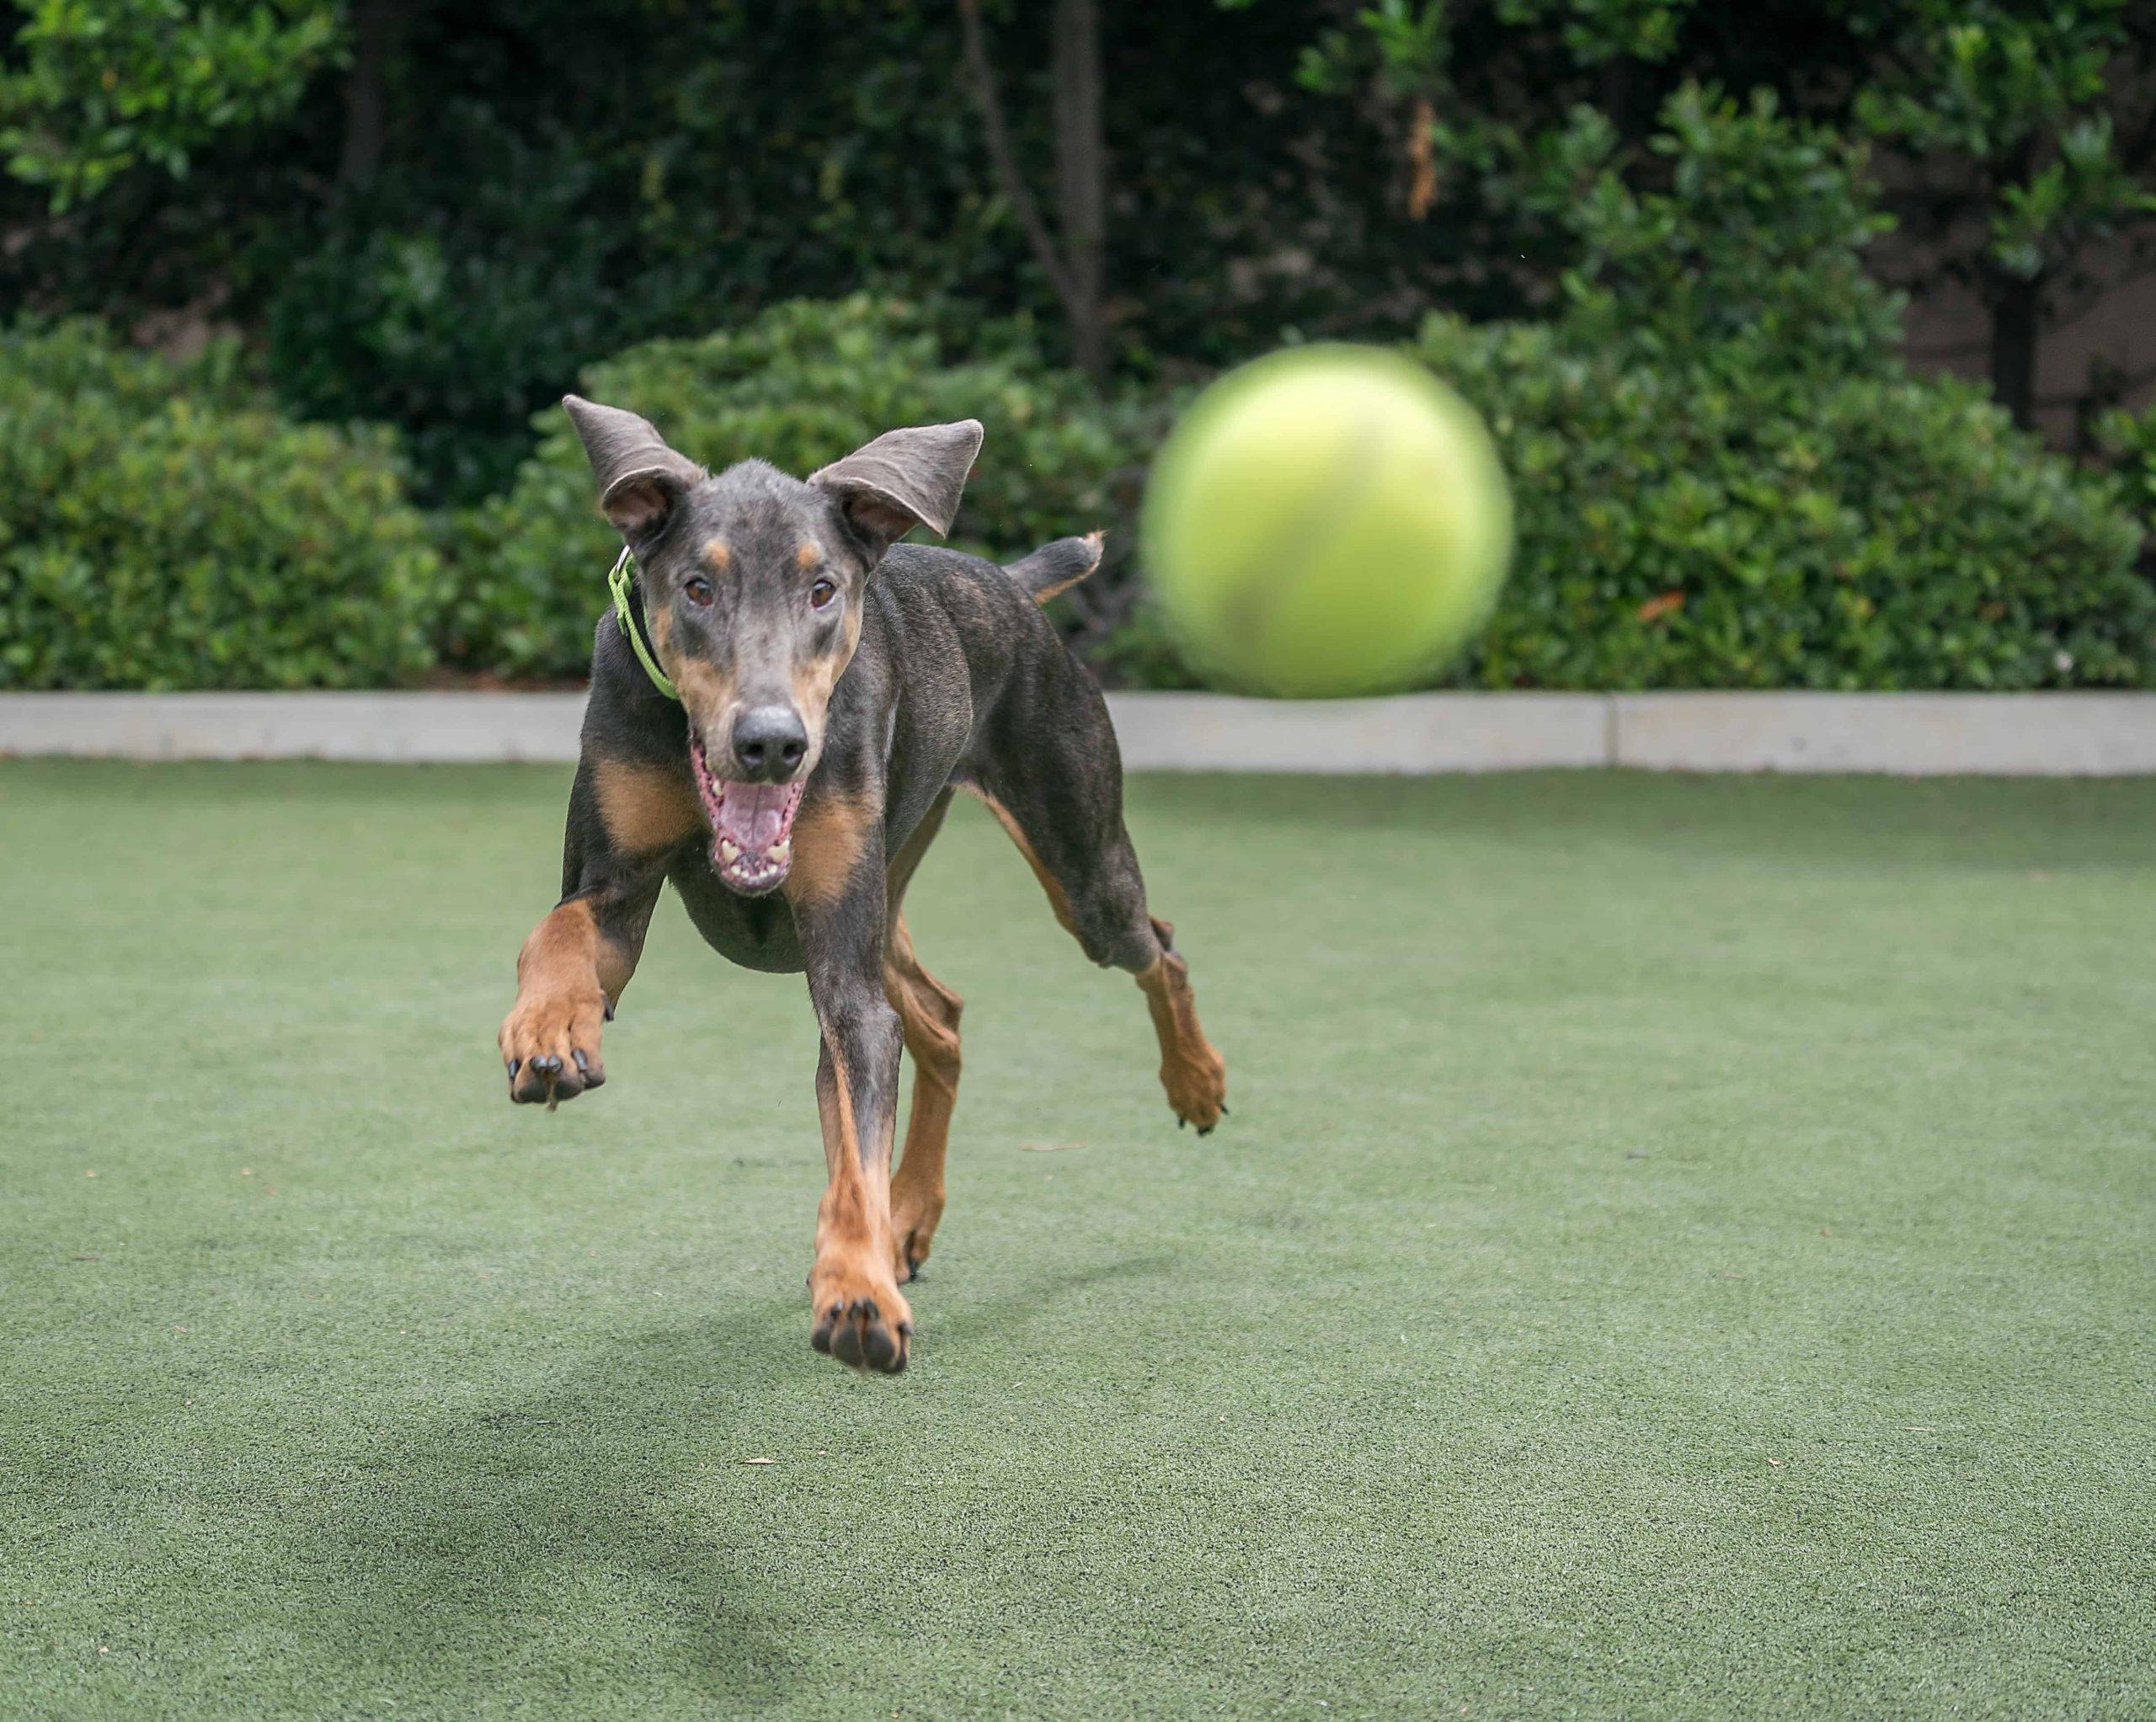 Clicker, Hundeschule & Co: Alles rund ums Hundetraining